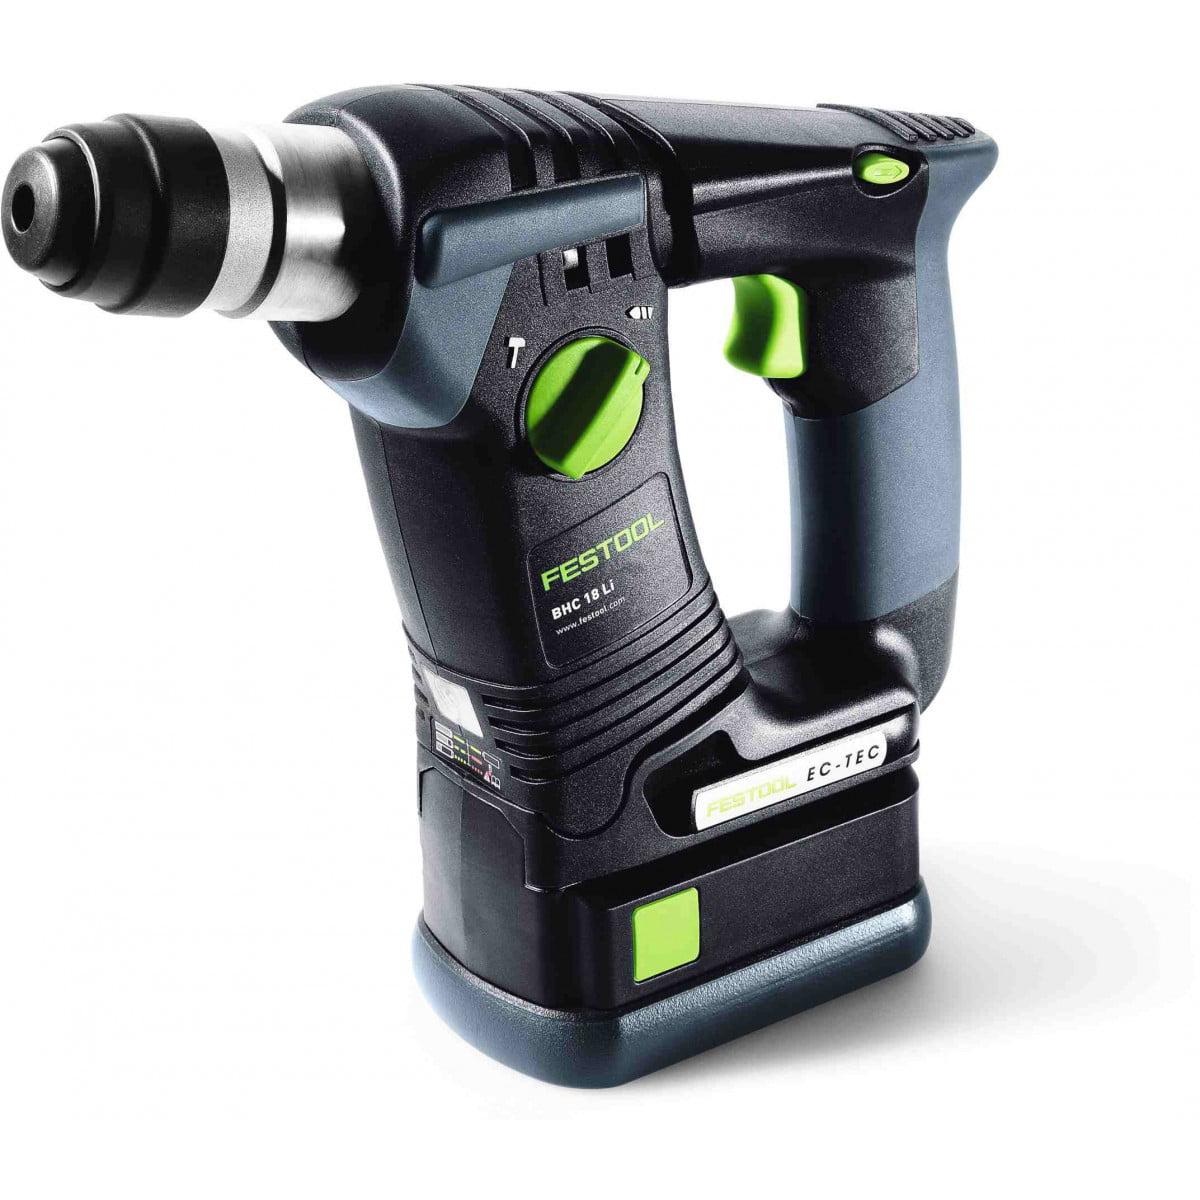 BHC 18 Cordless Rotary Hammer Drill AirStream PLUS